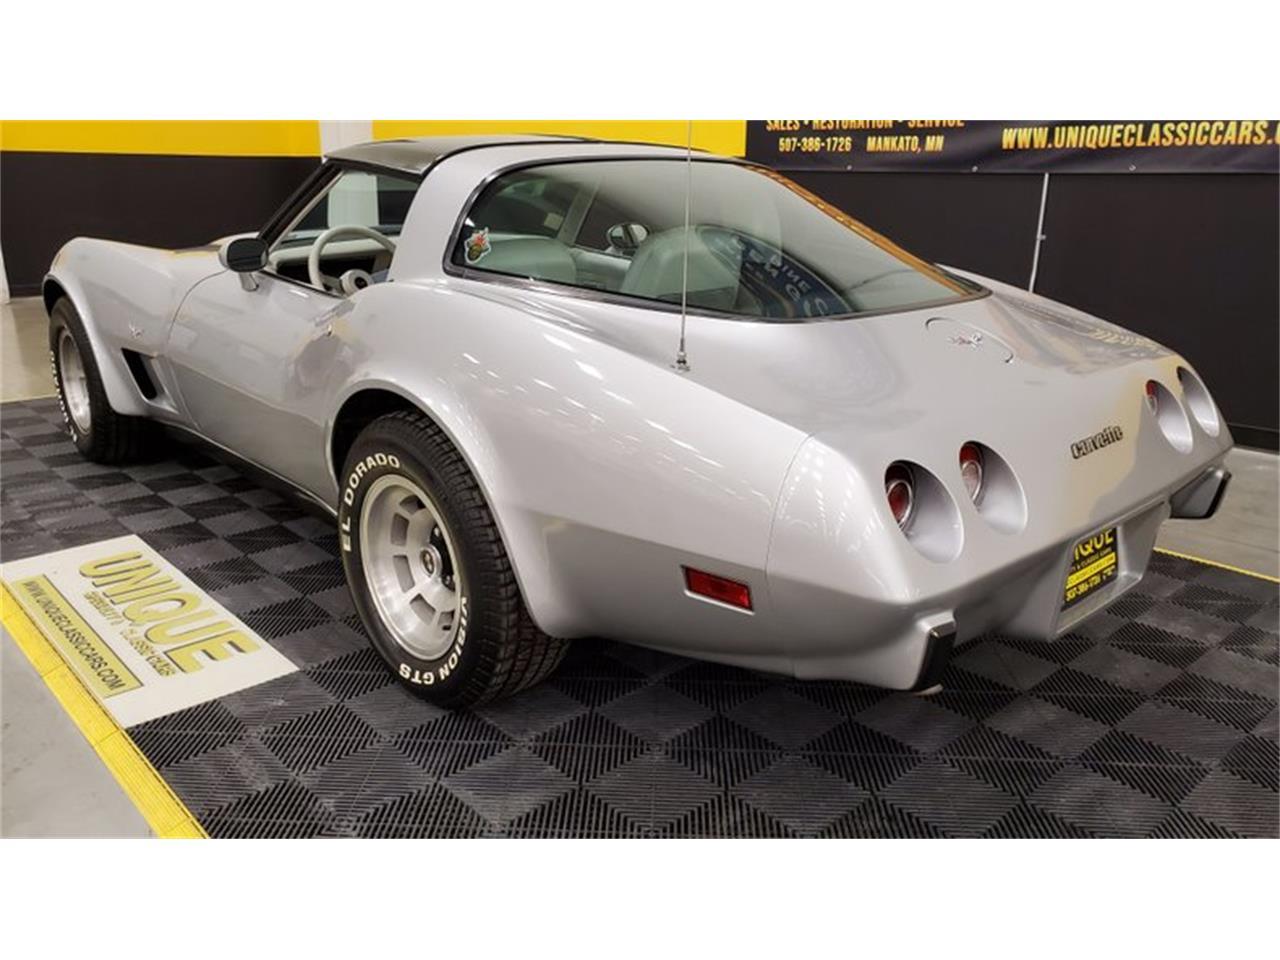 1979 Chevrolet Corvette (CC-1360594) for sale in Mankato, Minnesota